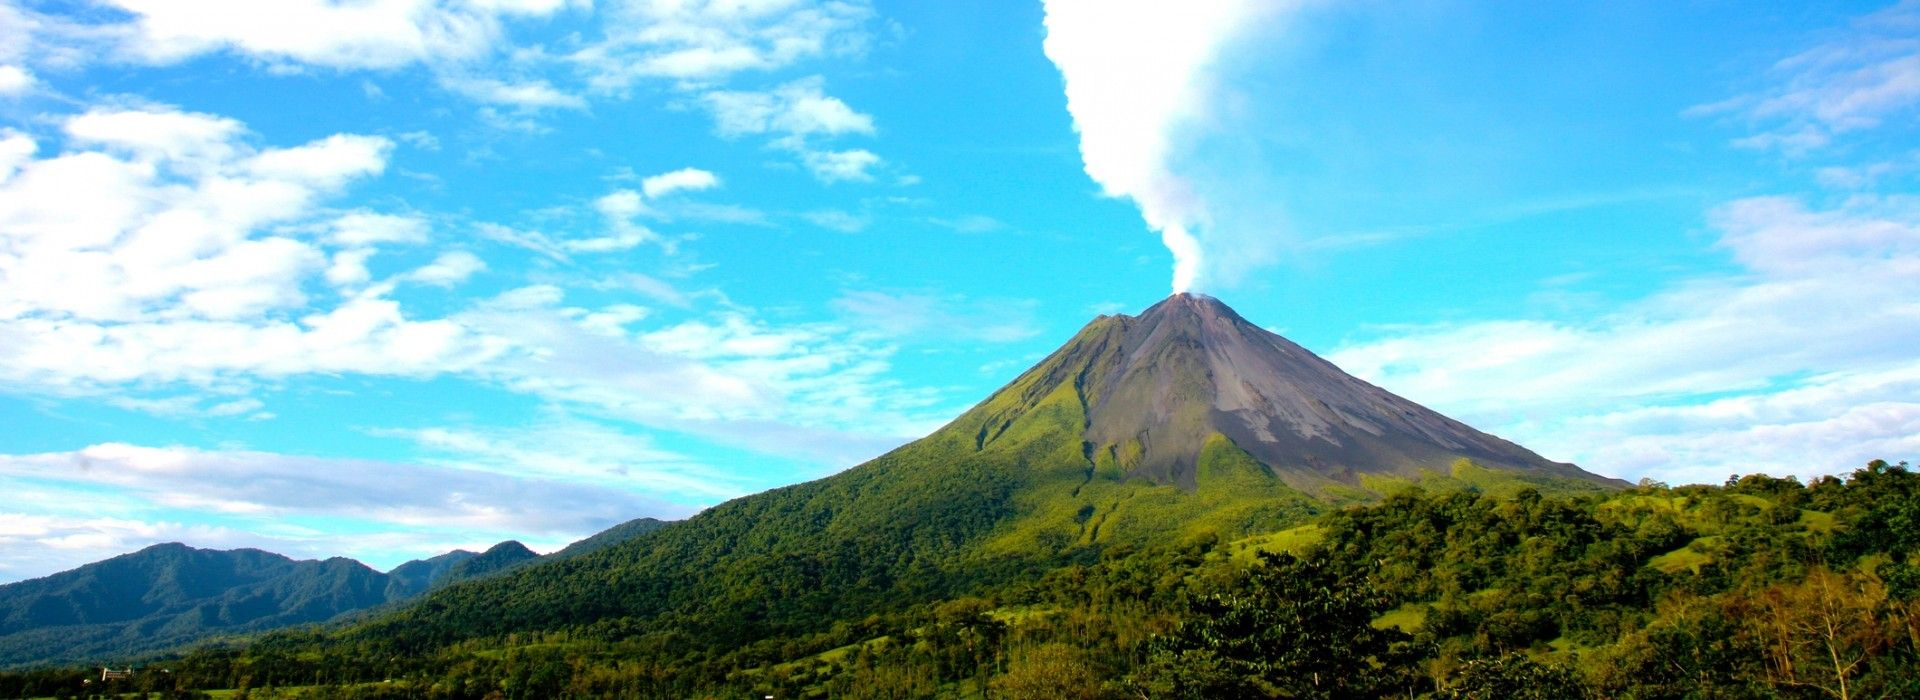 Natural landmarks sightseeing Tours in Manuel Antonio National Park